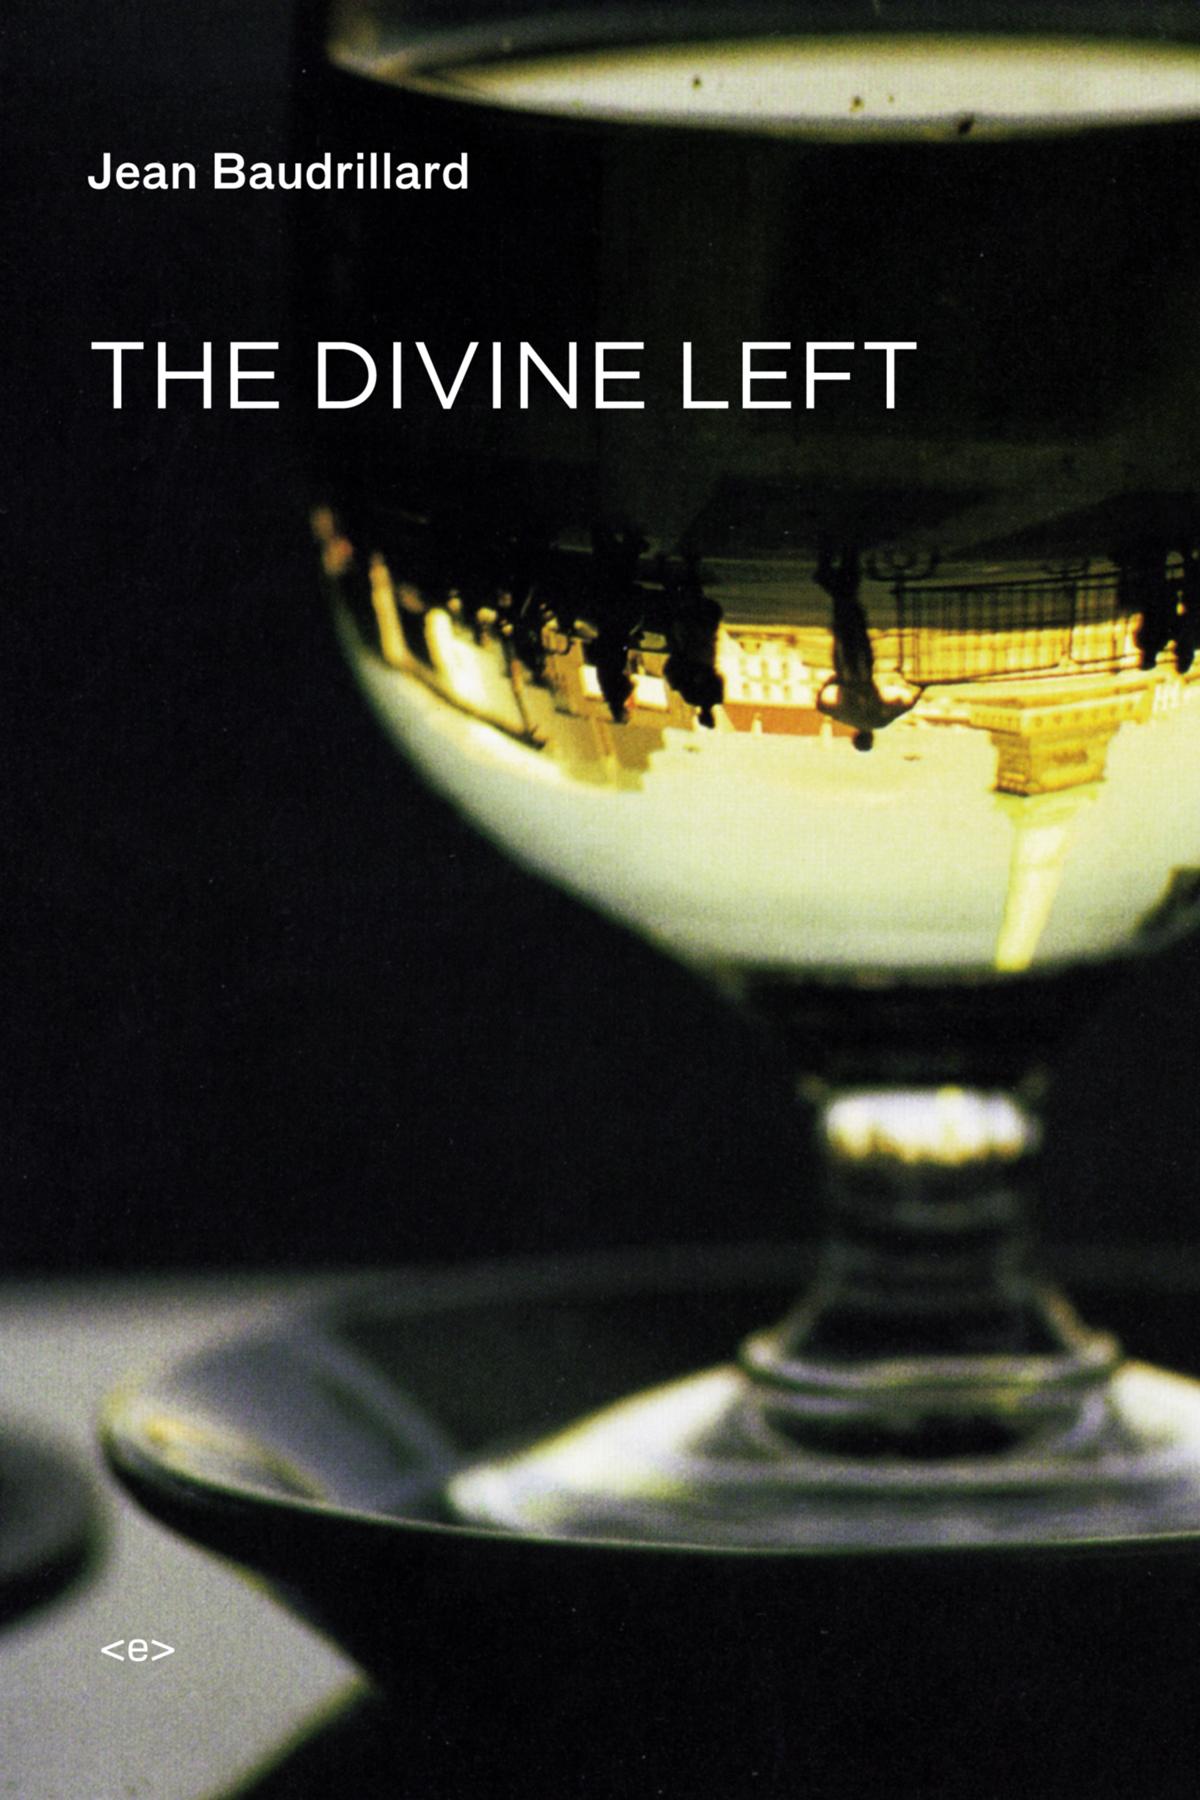 The Divine Left